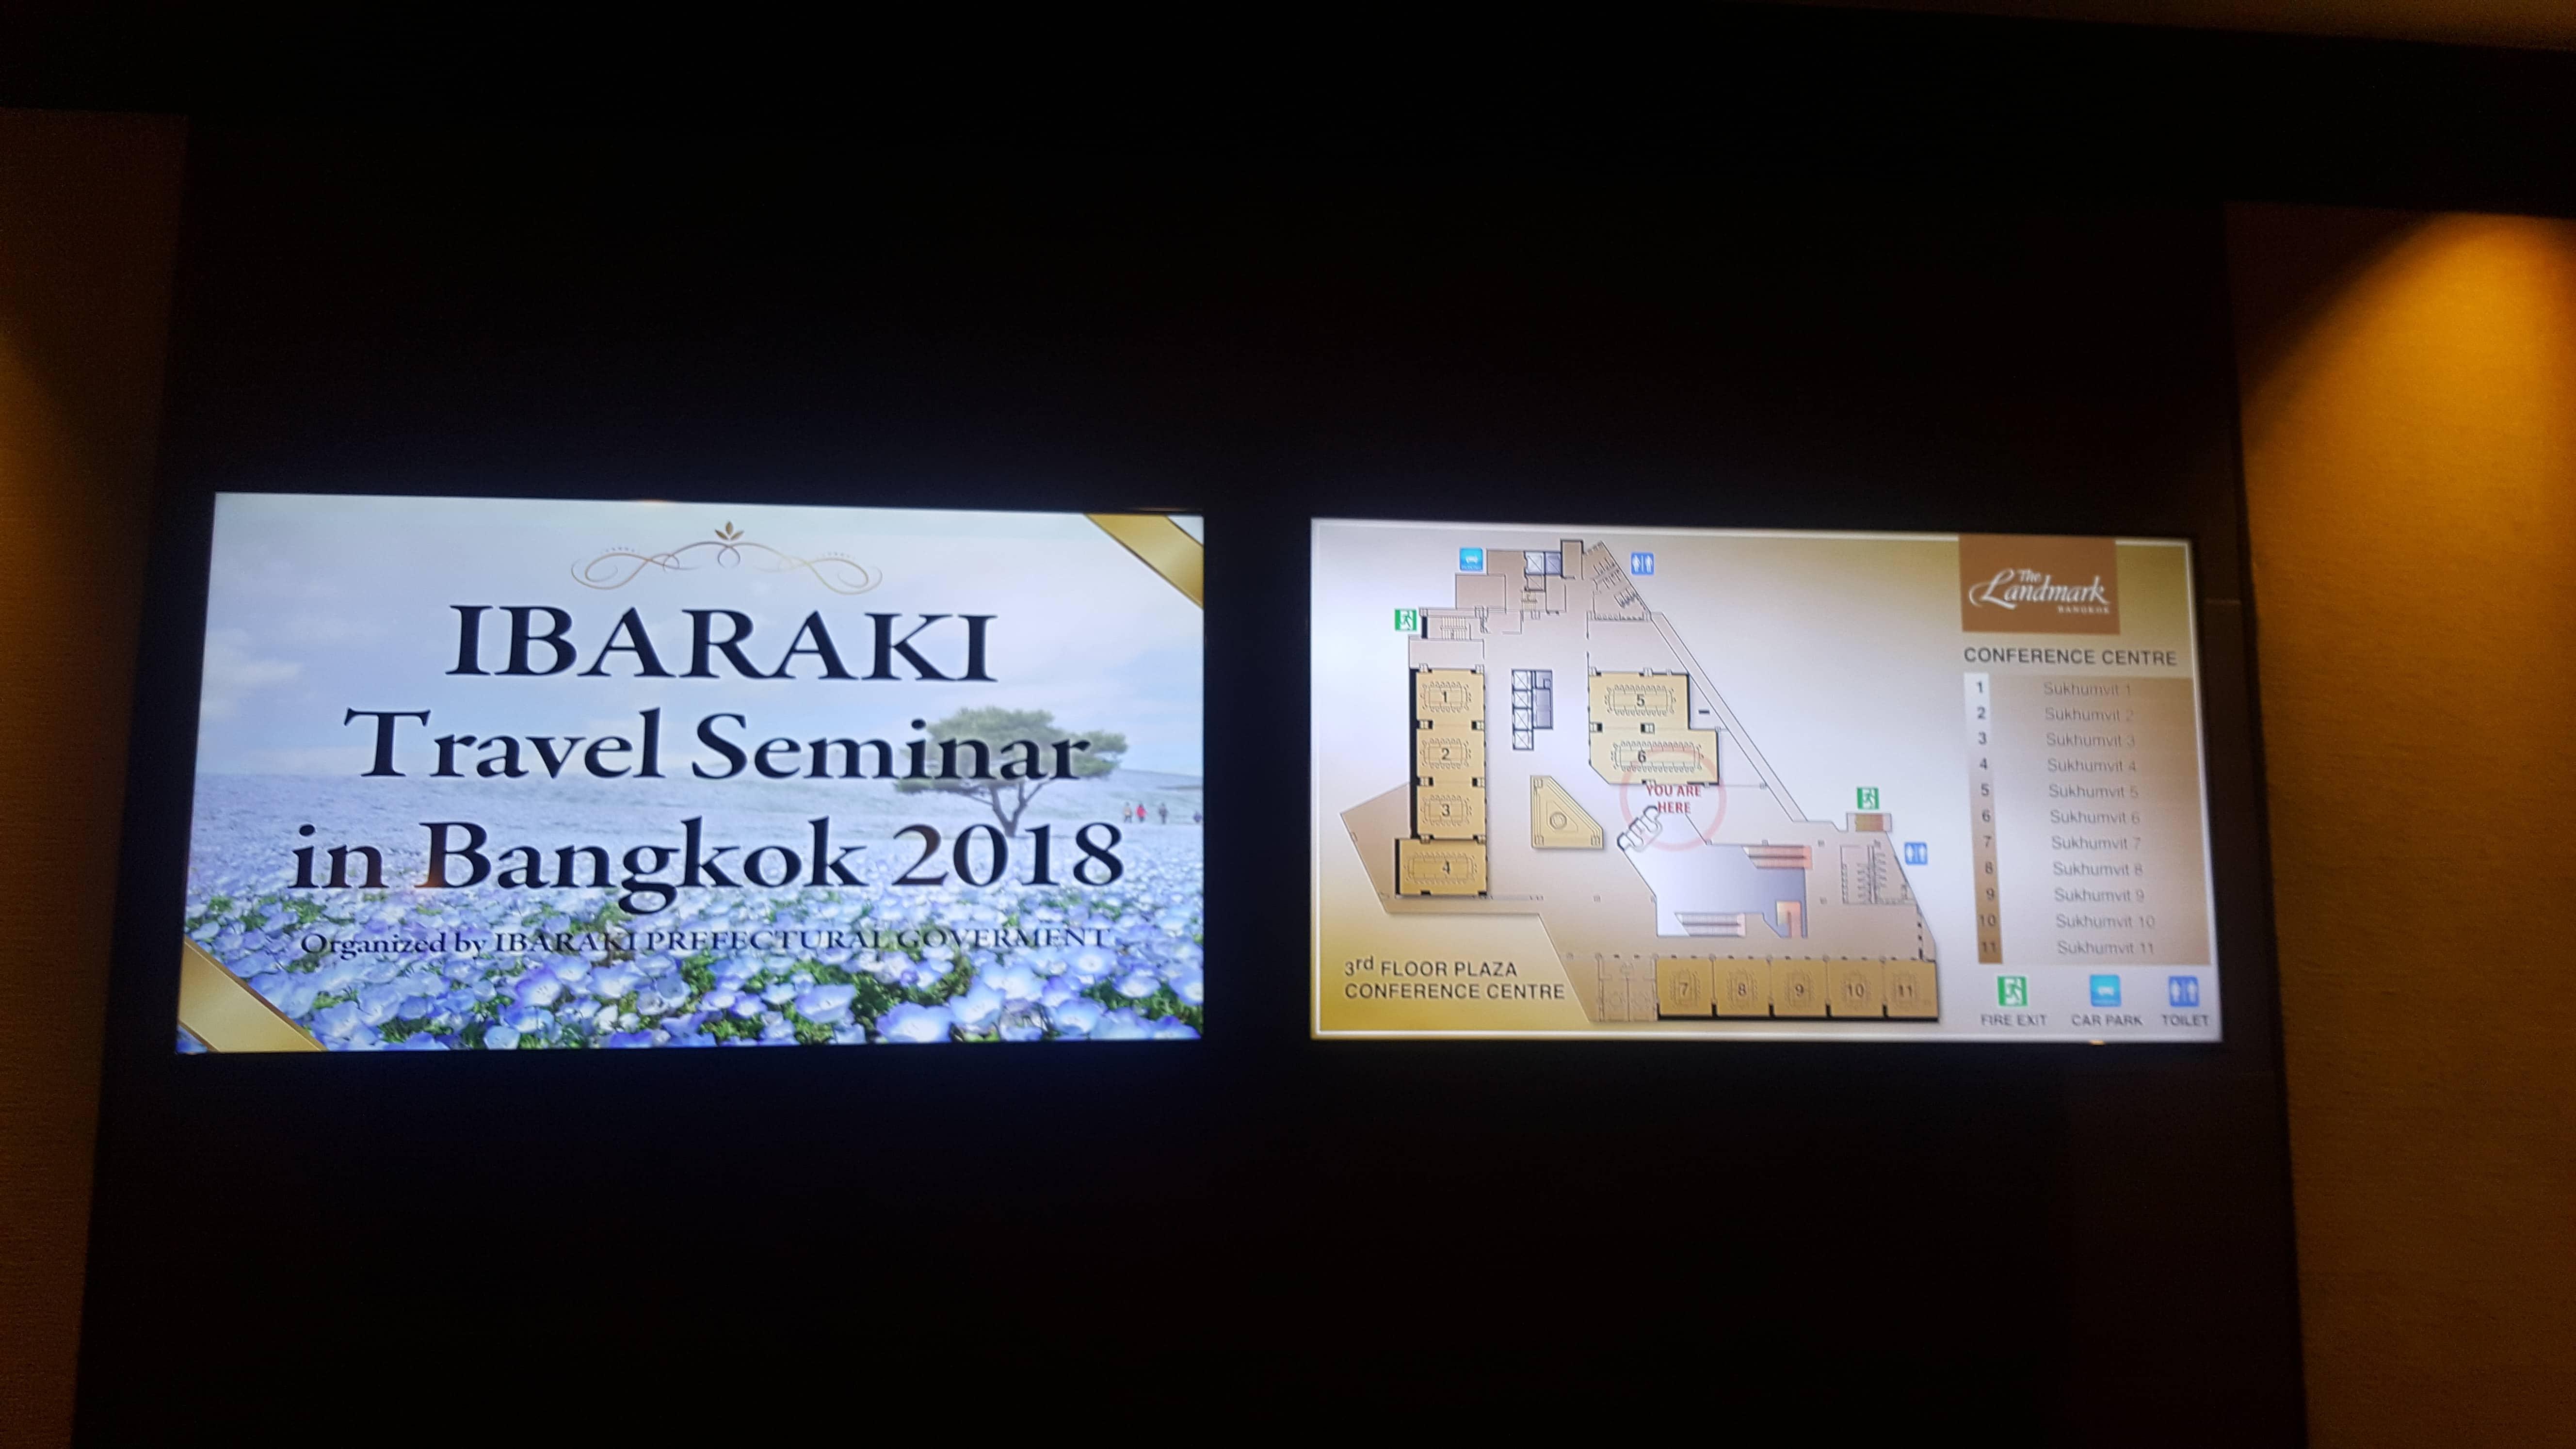 Ibaraki Travel Seminar in Bangkok 2018